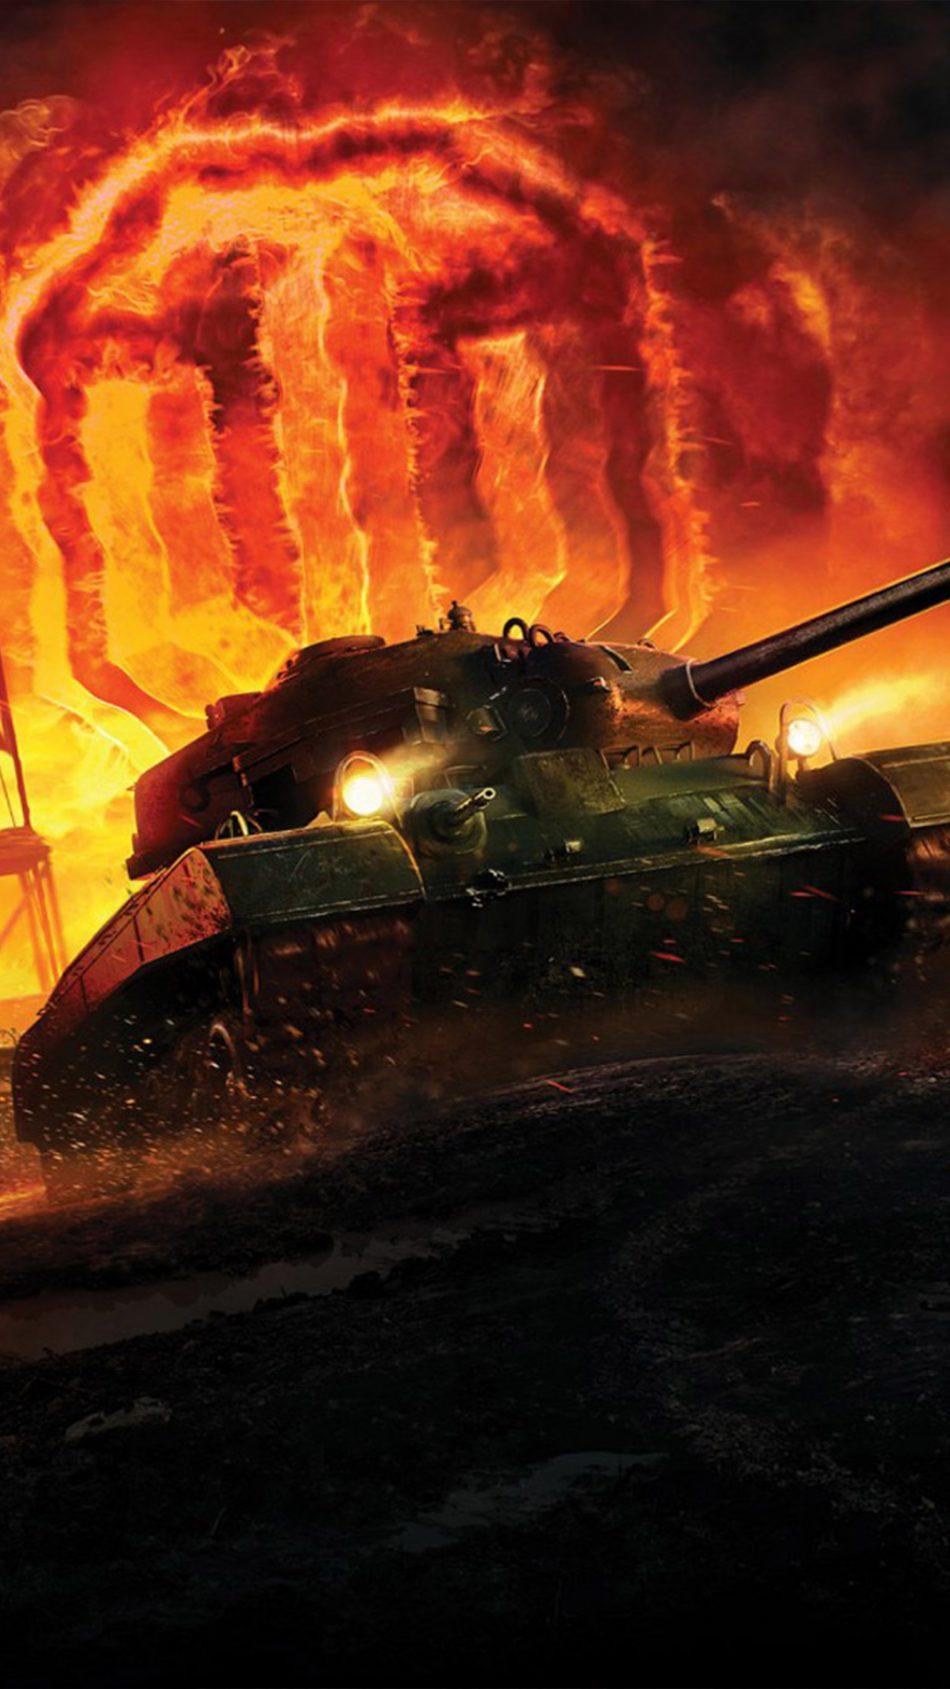 World of Tanks Video Game 4K Ultra HD Mobile Wallpaper